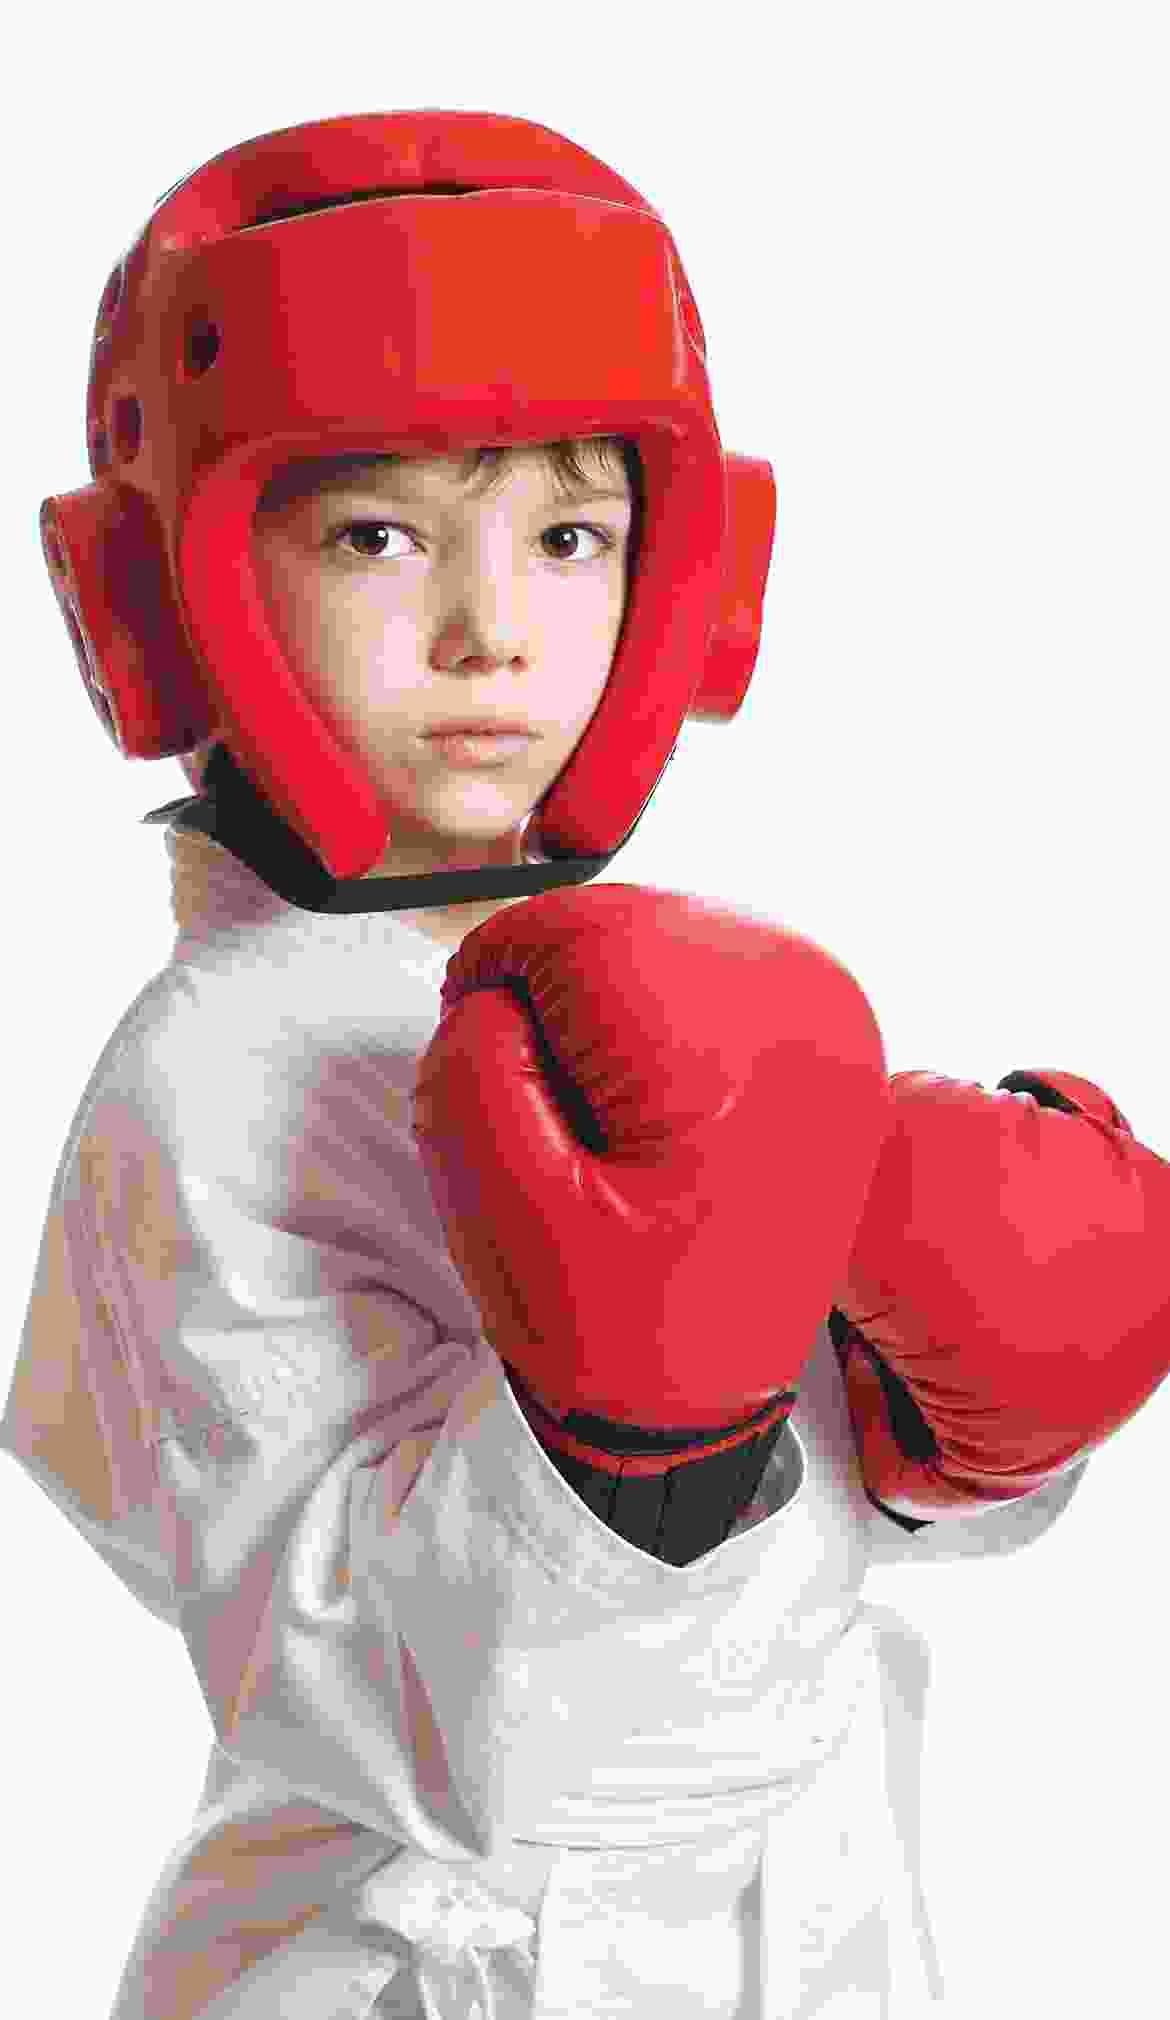 Boxing Kid